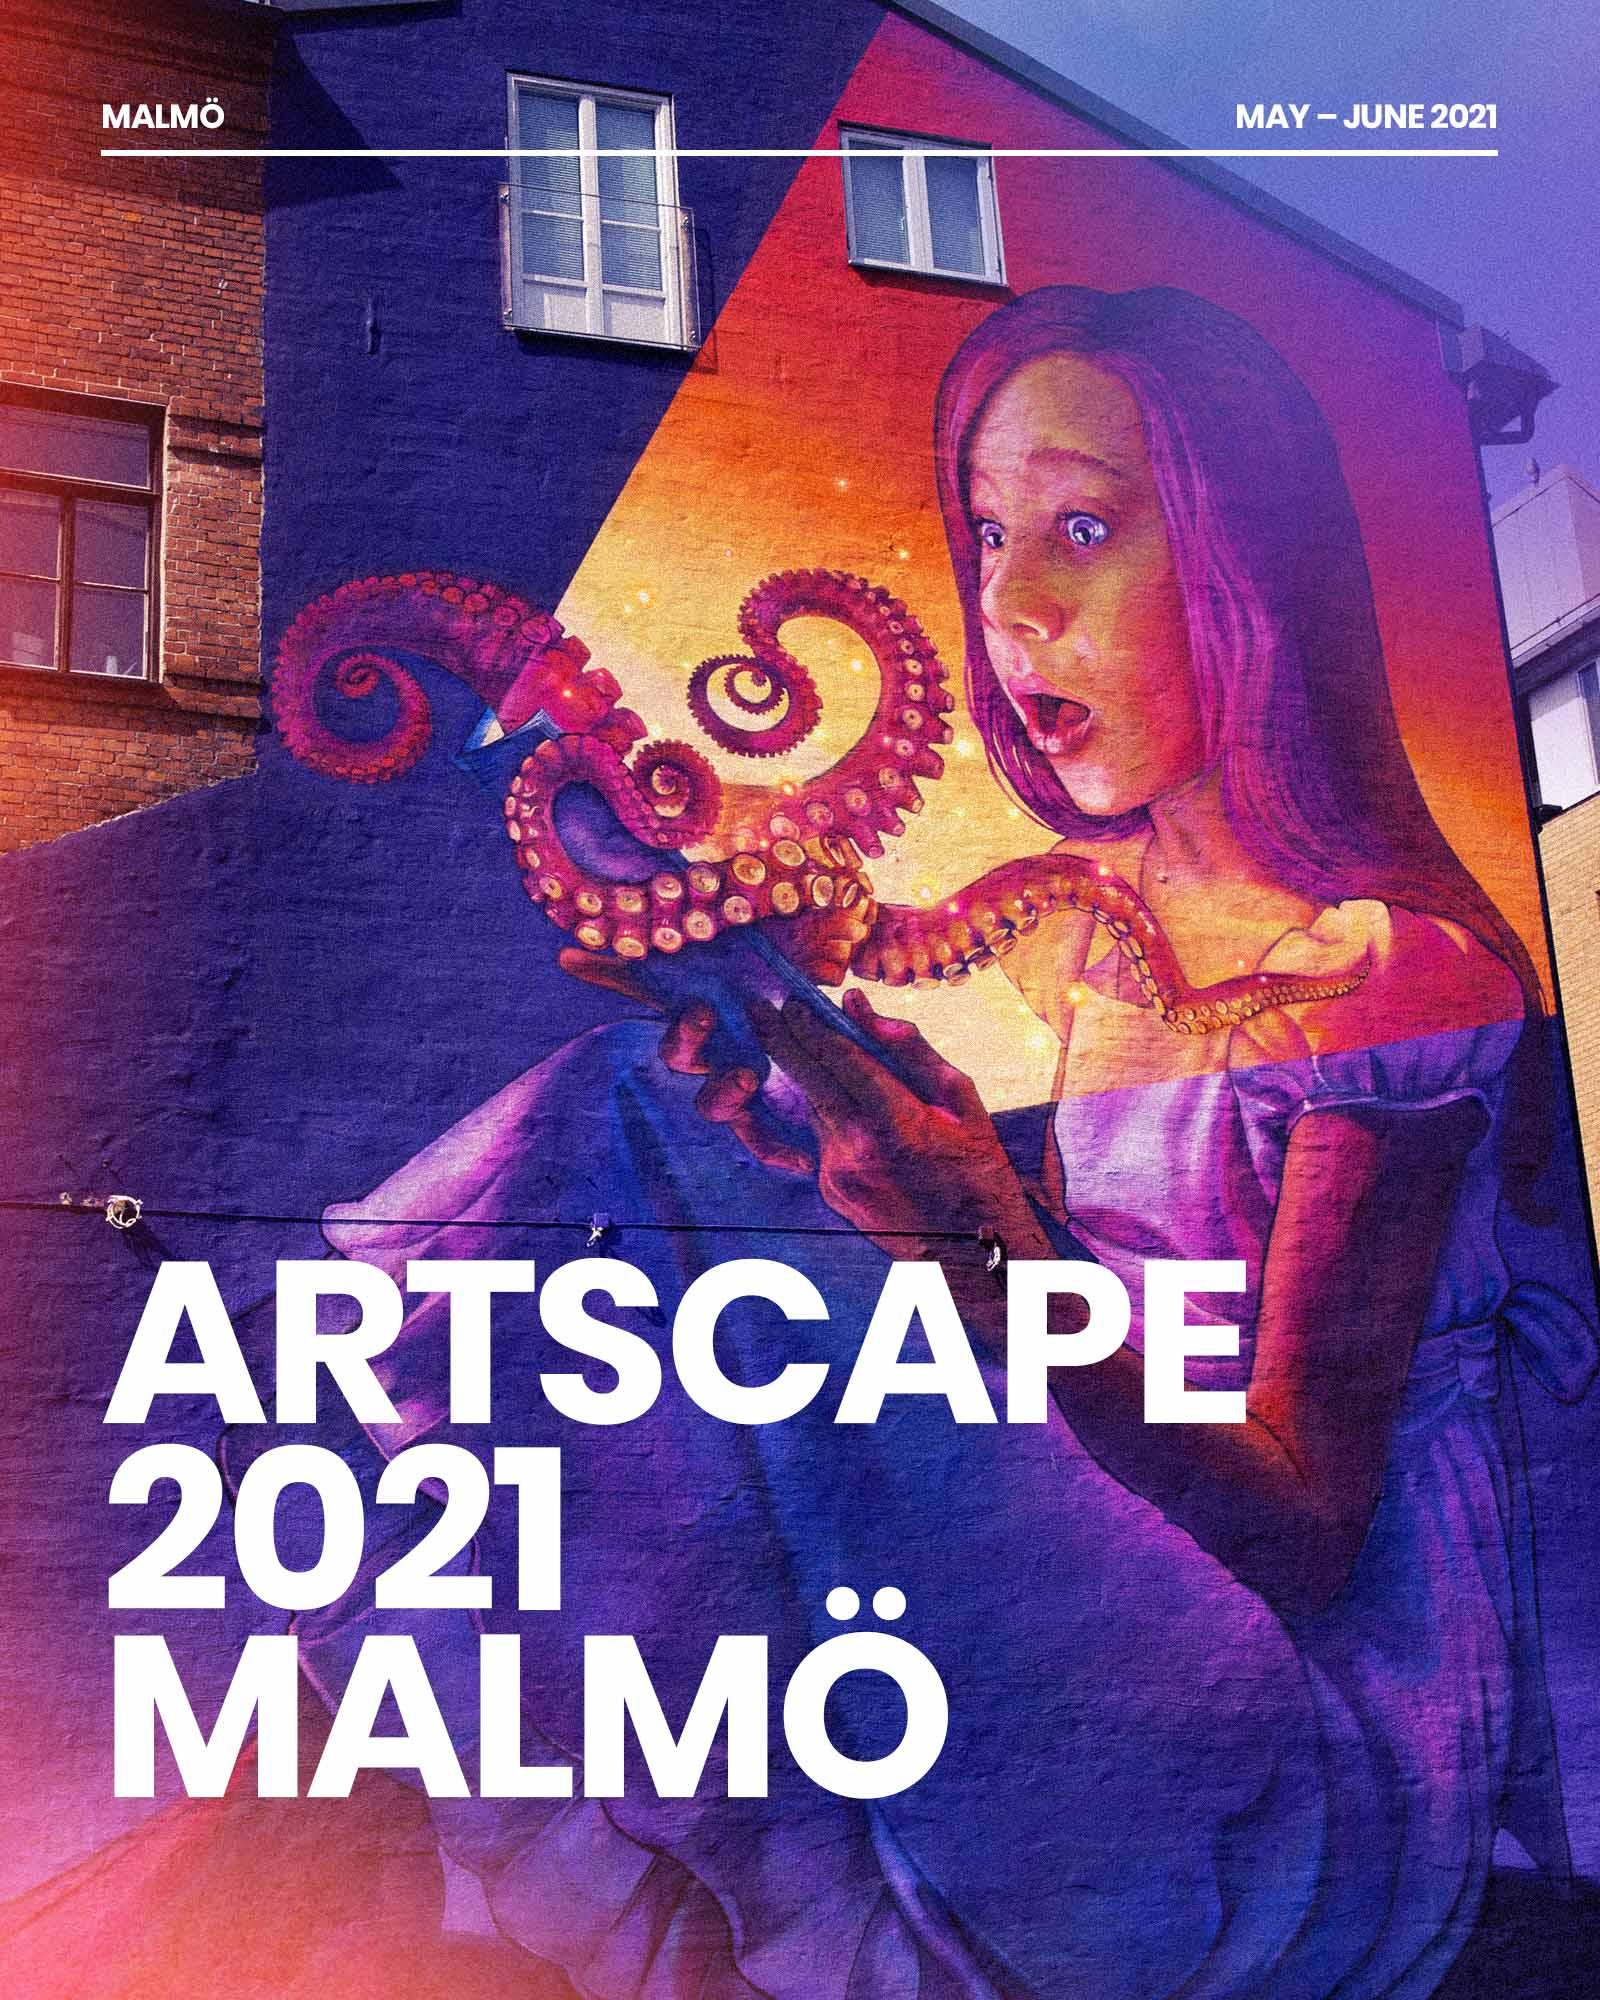 ARTSCAPE 2021 MALMÖ